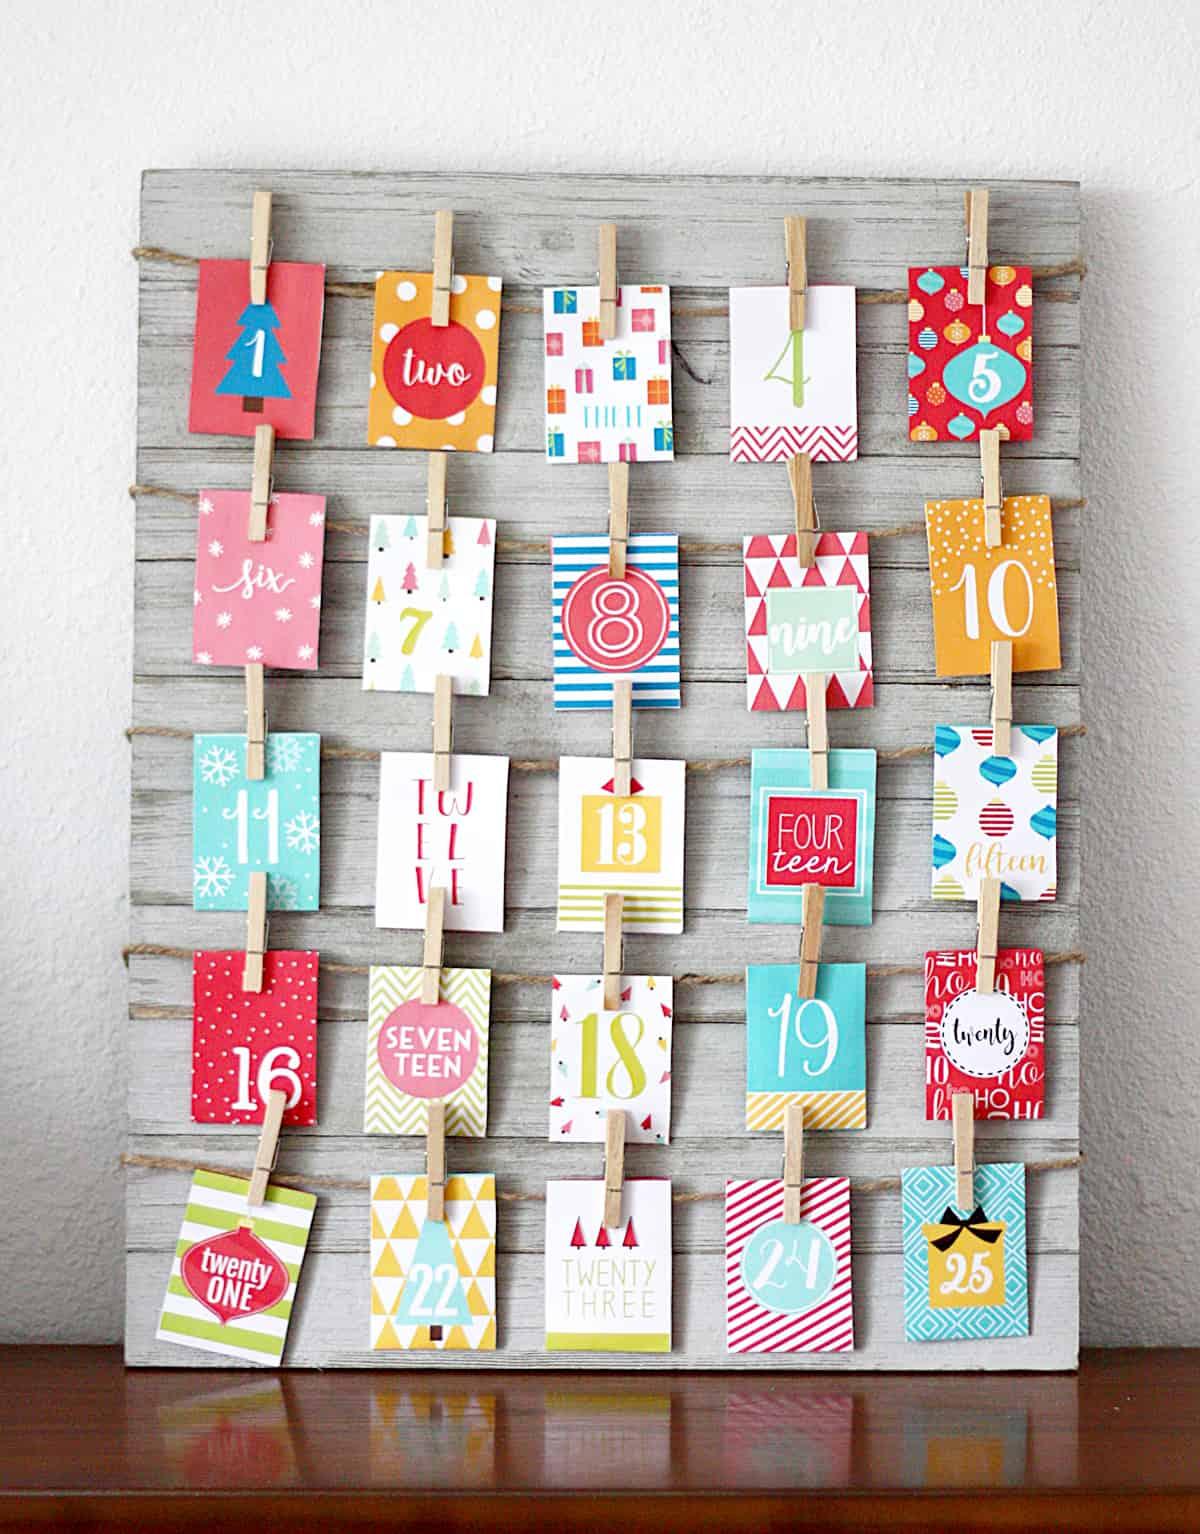 Free Printable Advent Calendar - Loads Of Fun | Skip To My Lou